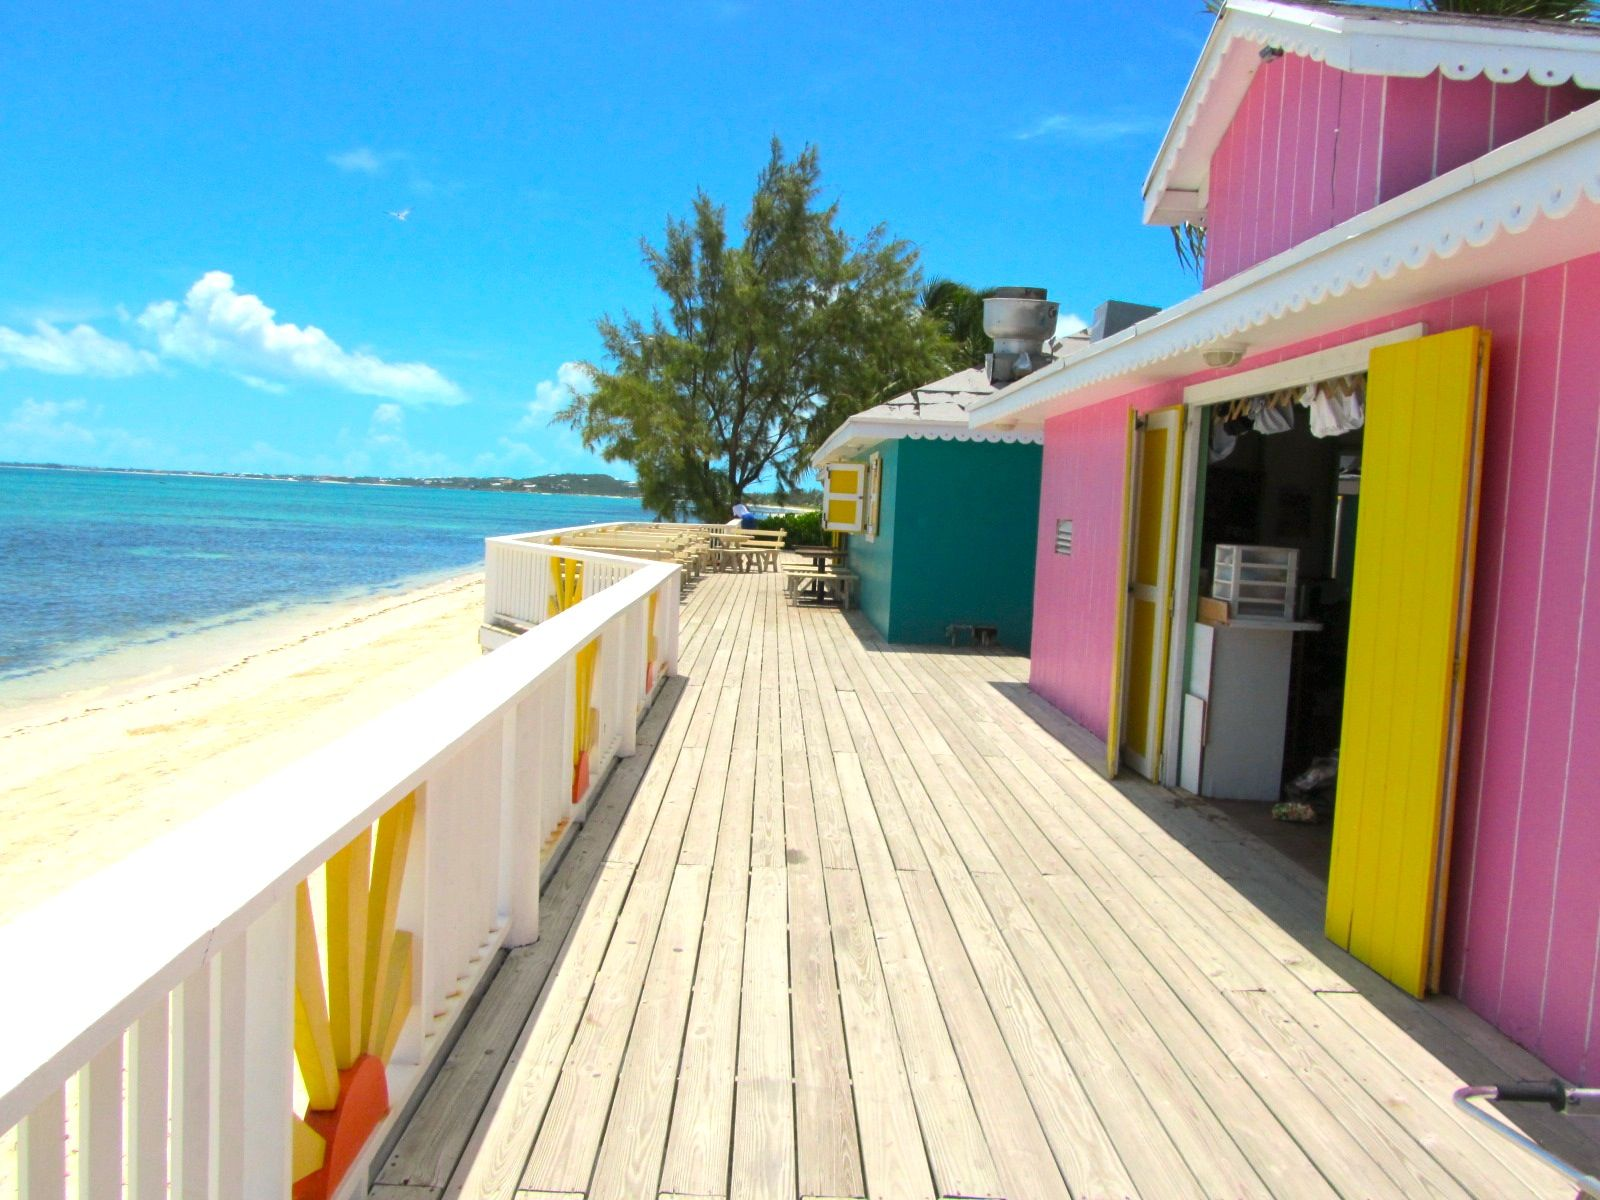 Turks and Caicos. 2010.